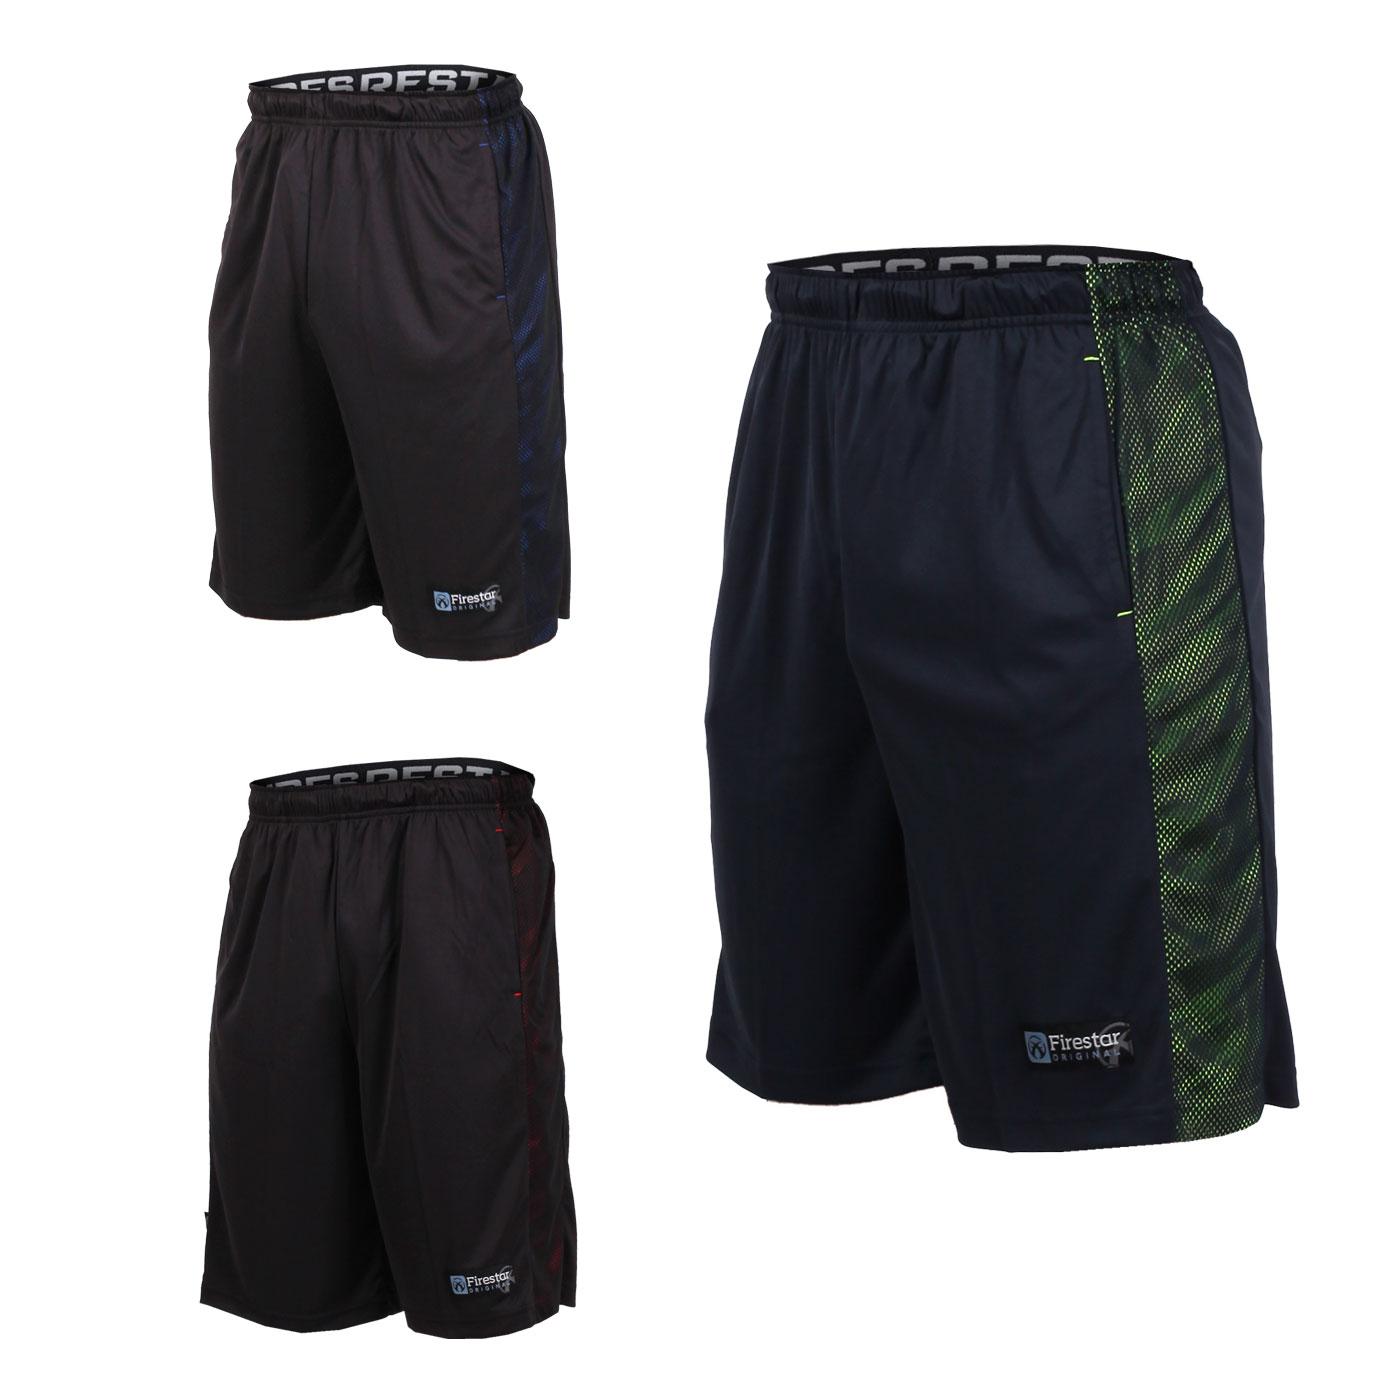 FIRESTAR 男籃球褲 B7603-40